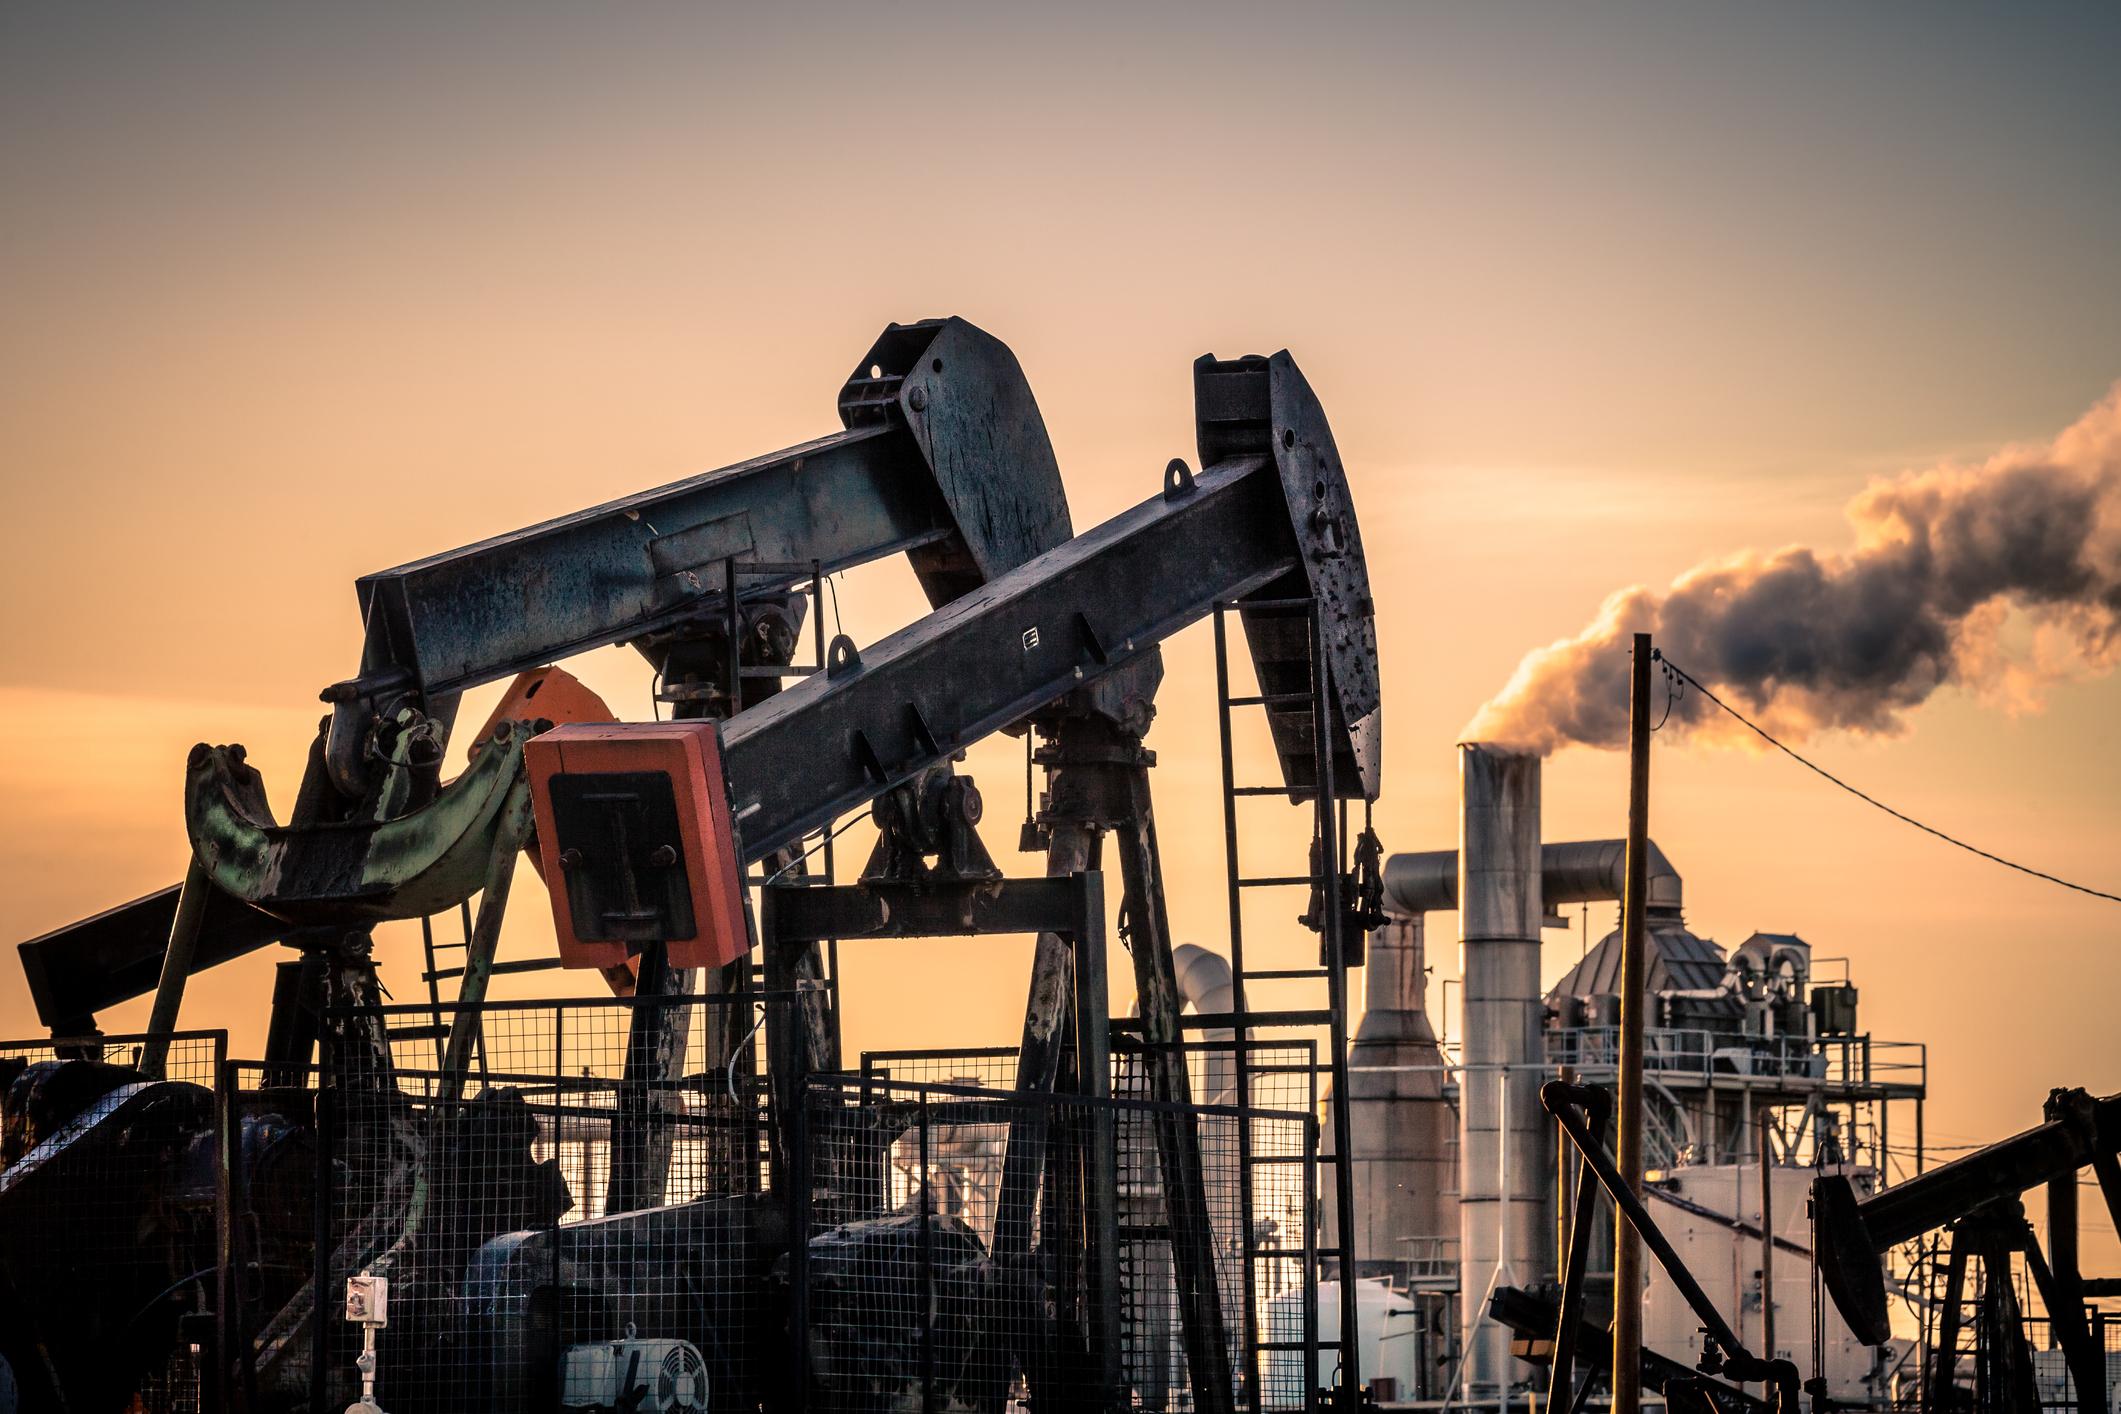 Oil pumps near an industrial complex in California.